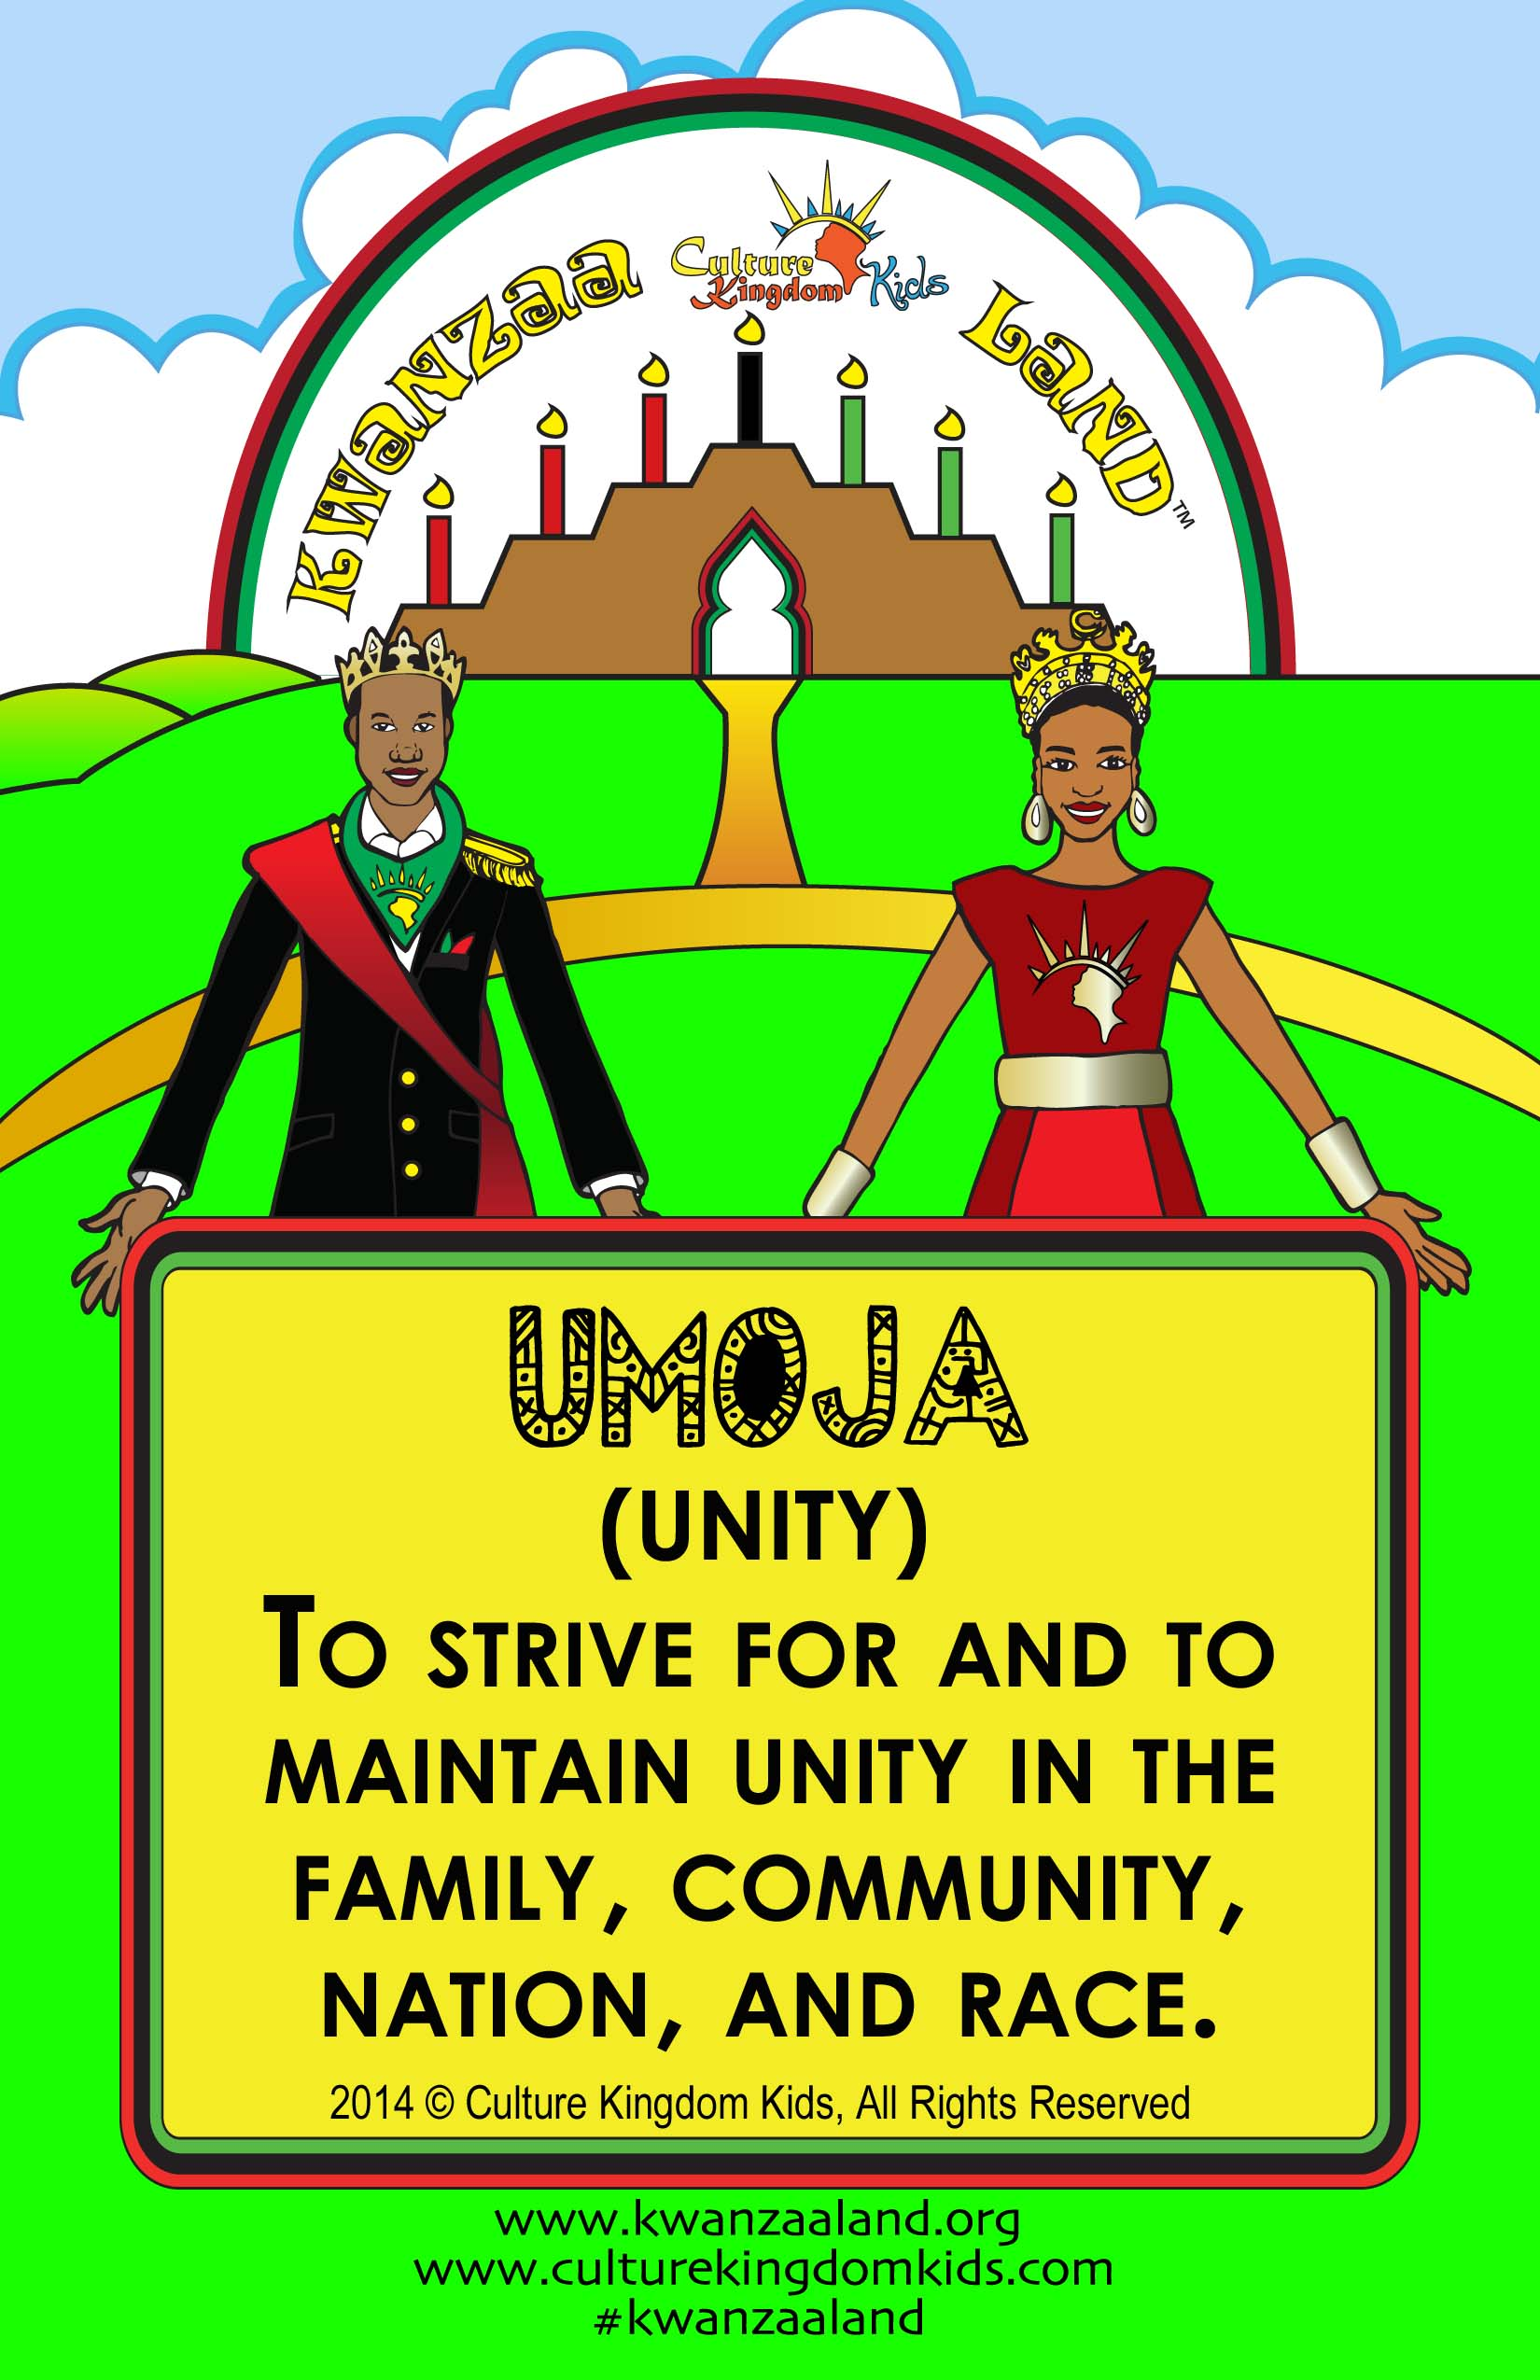 About Kwanzaa Land Culture Kingdom Kids Kwanzaa Land